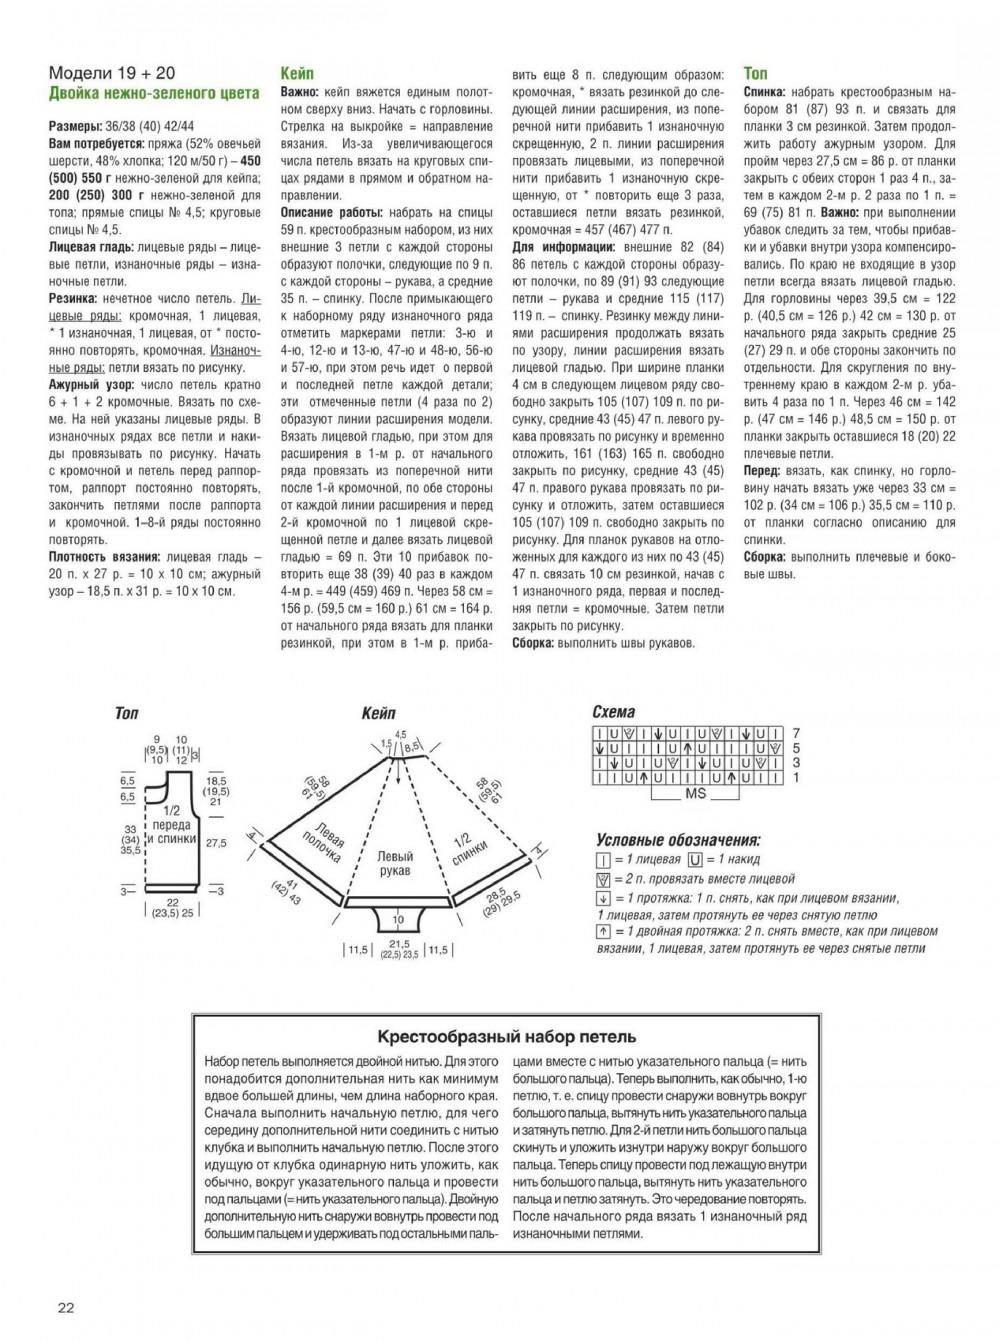 Page_00022.jpg